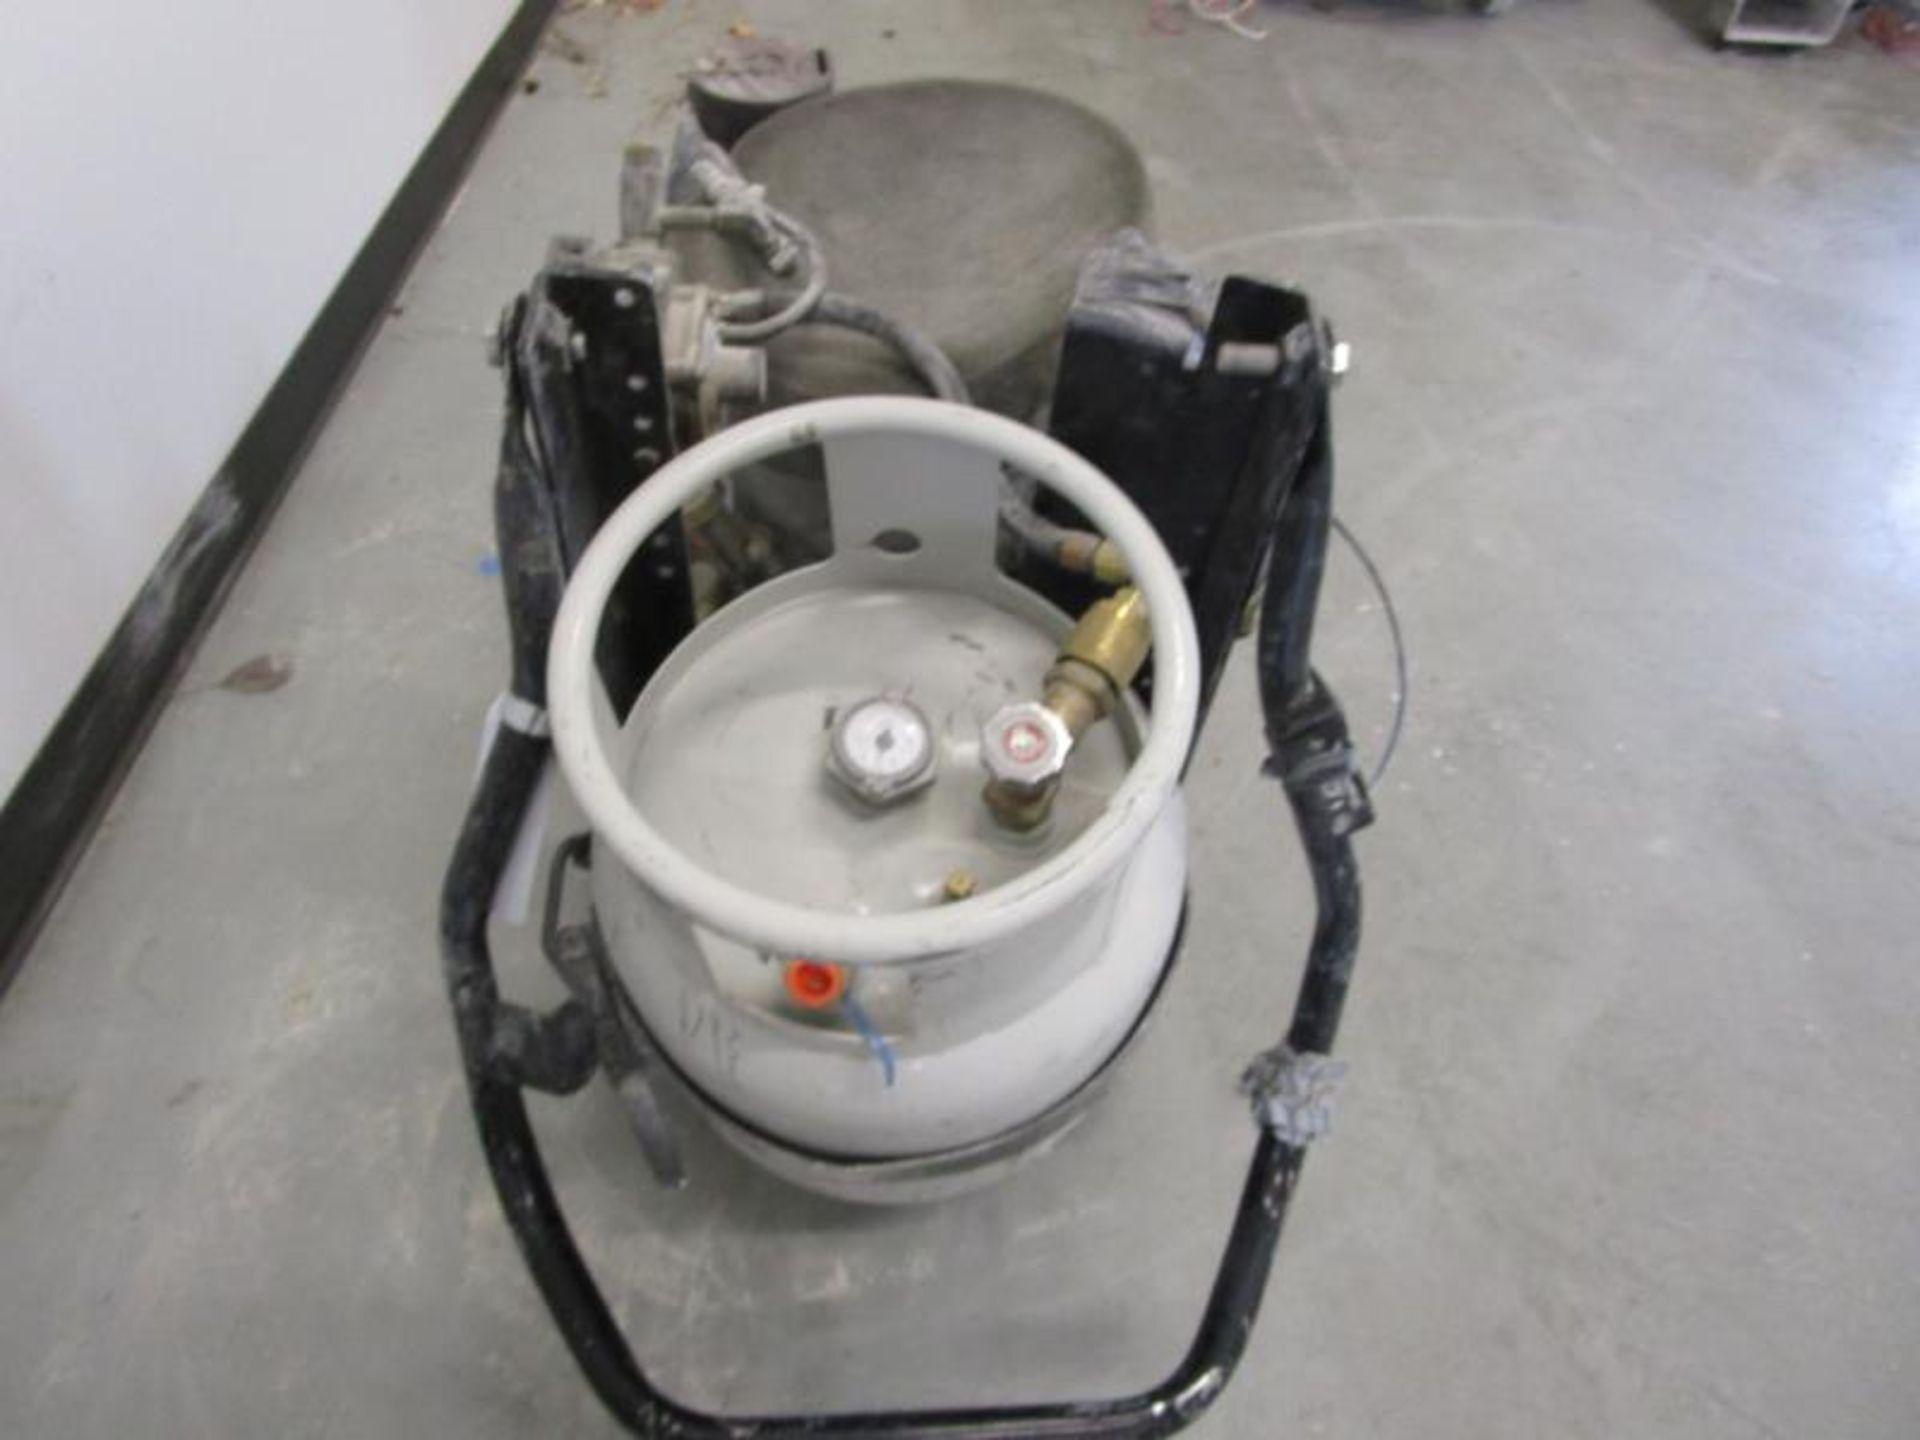 Lot 5 - Floor Burnisher w/ Kawasaki Engine FH541V, 17HP, 1,430 Hours